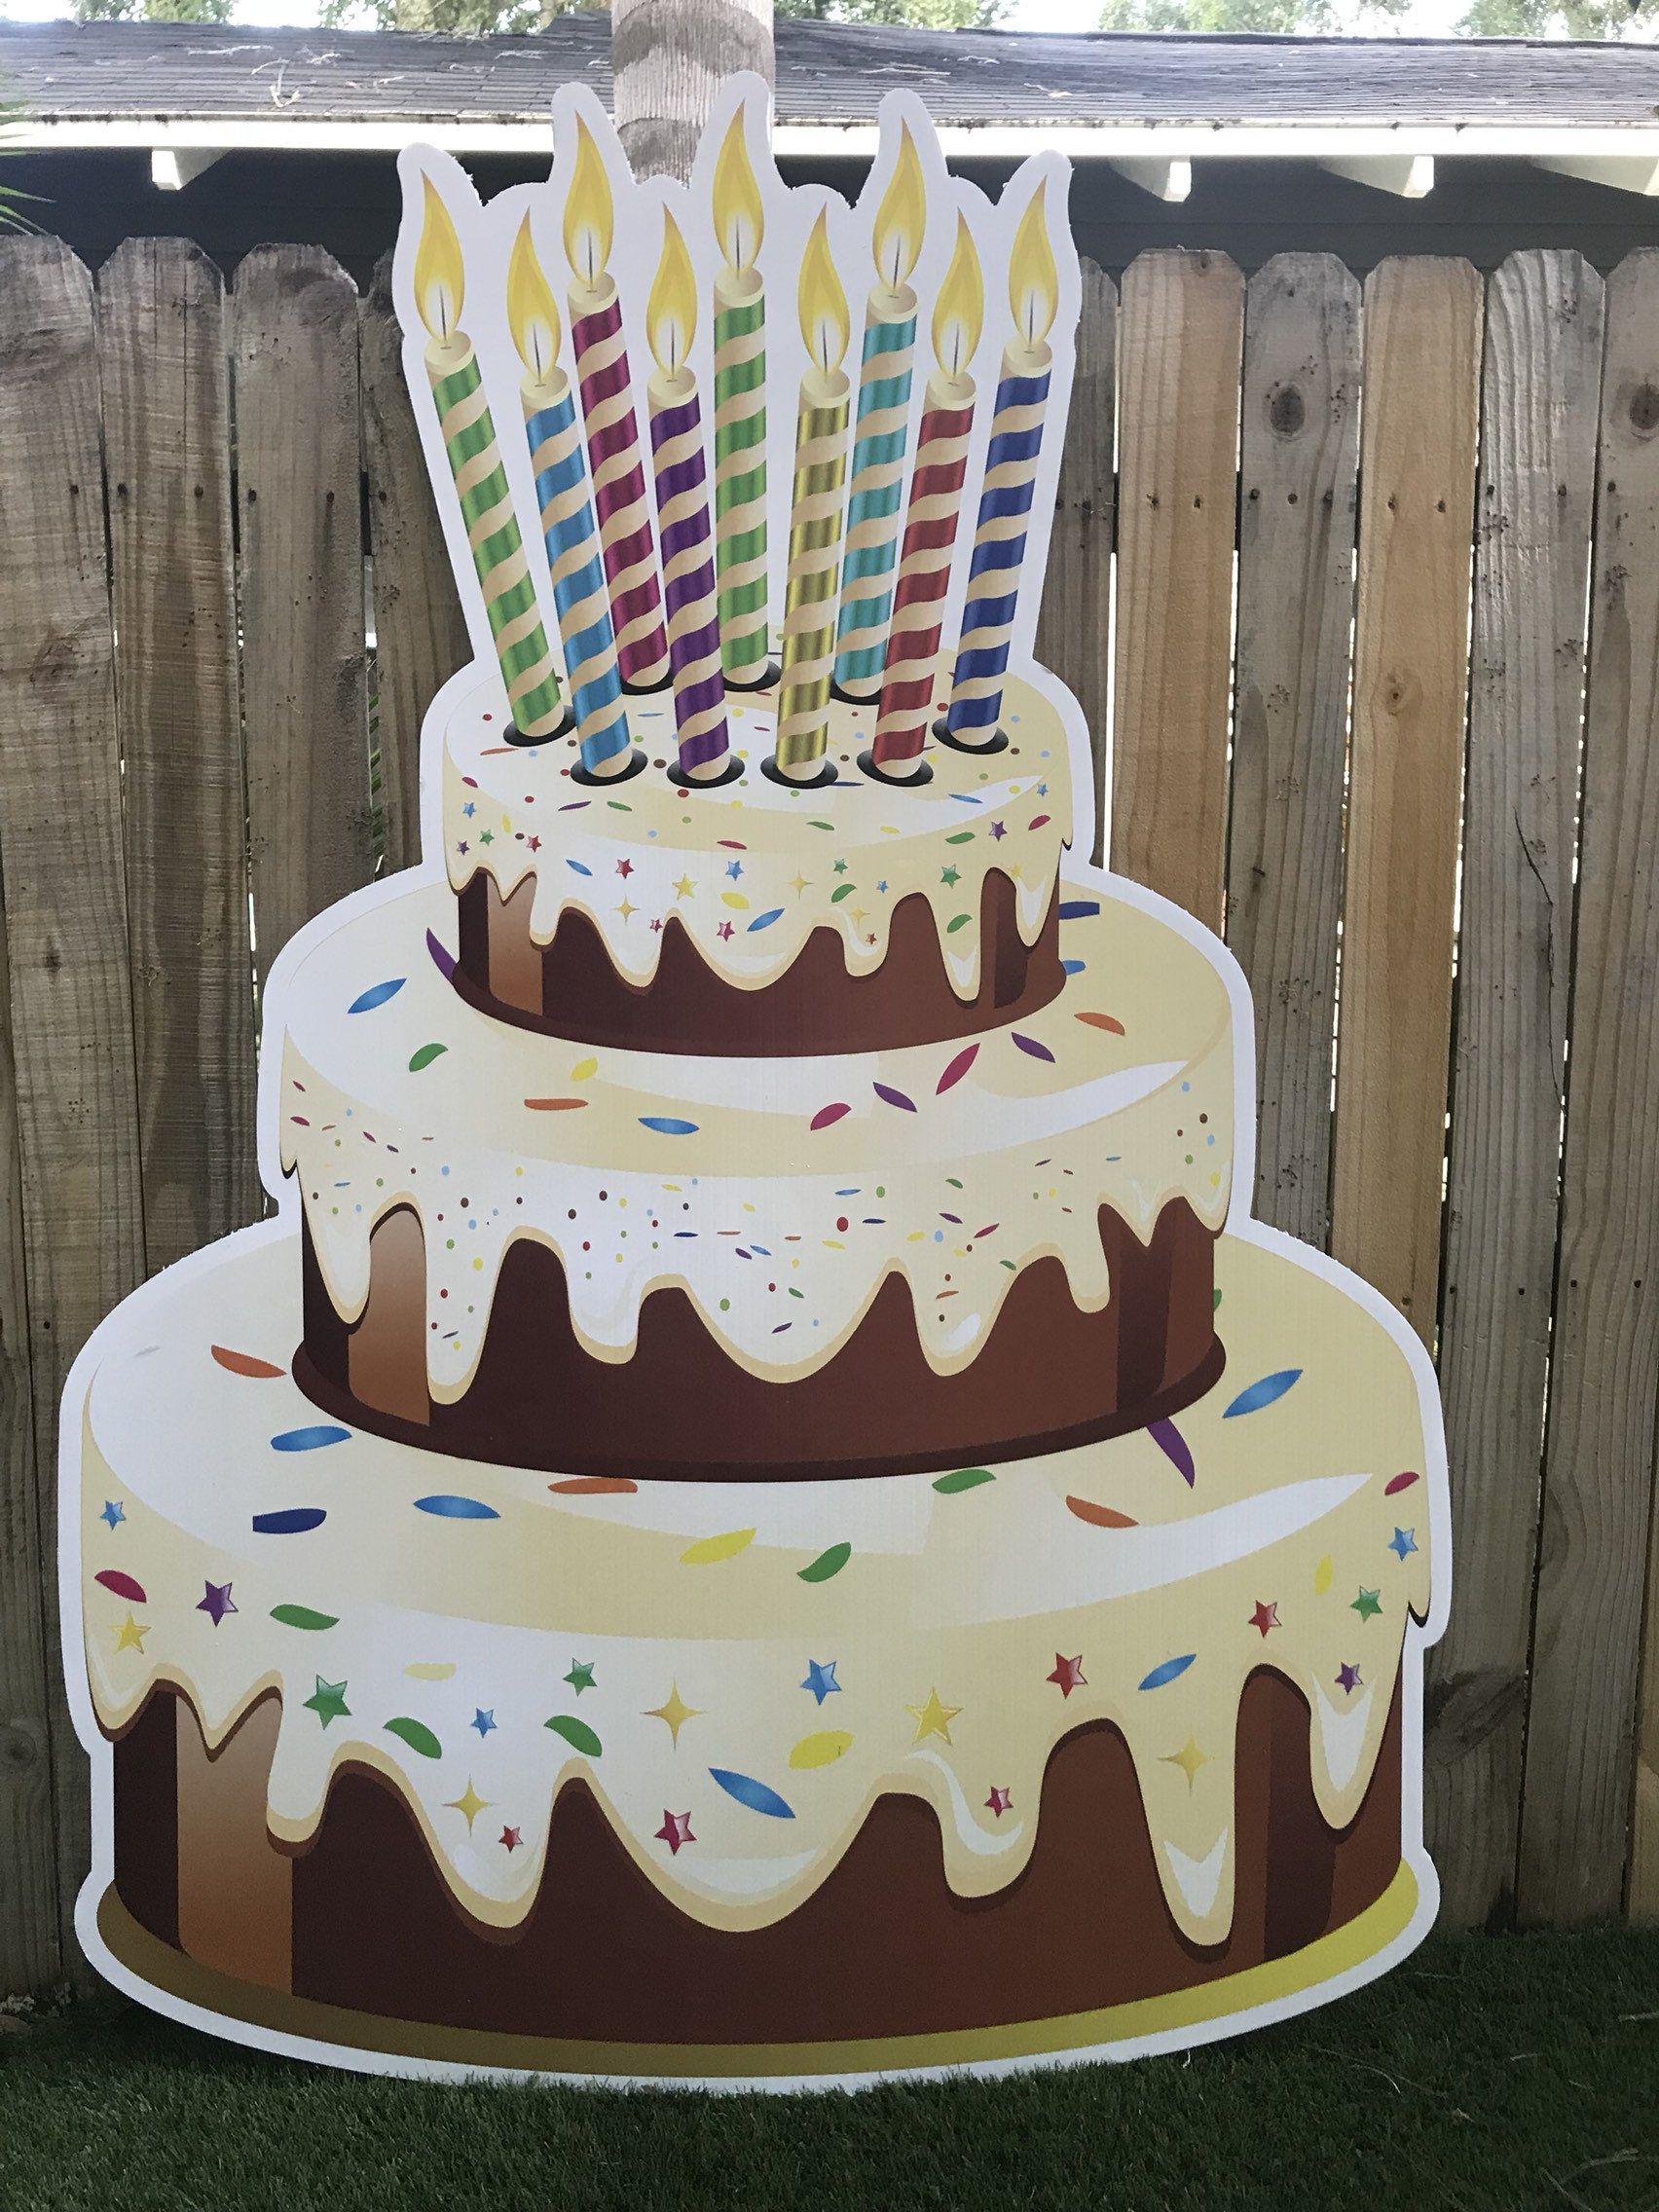 Birthday cake birthday yard sign birthday decoration